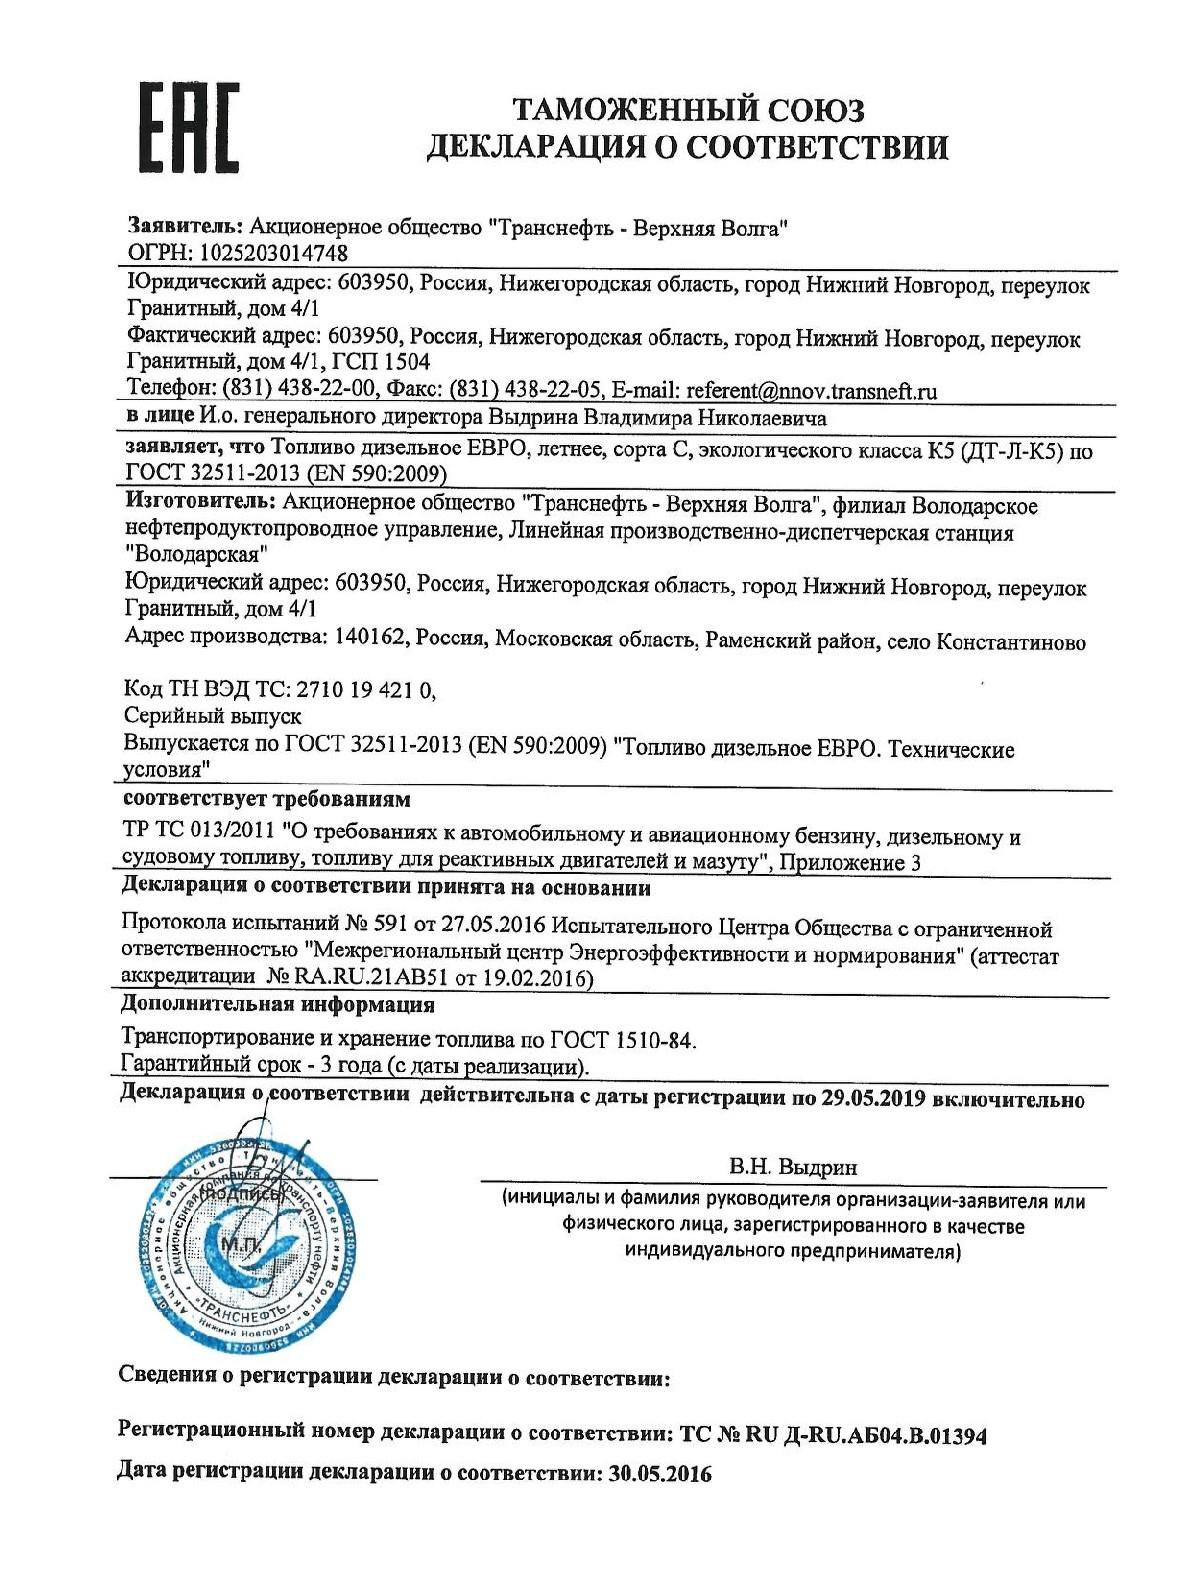 гост р 50 591 2013